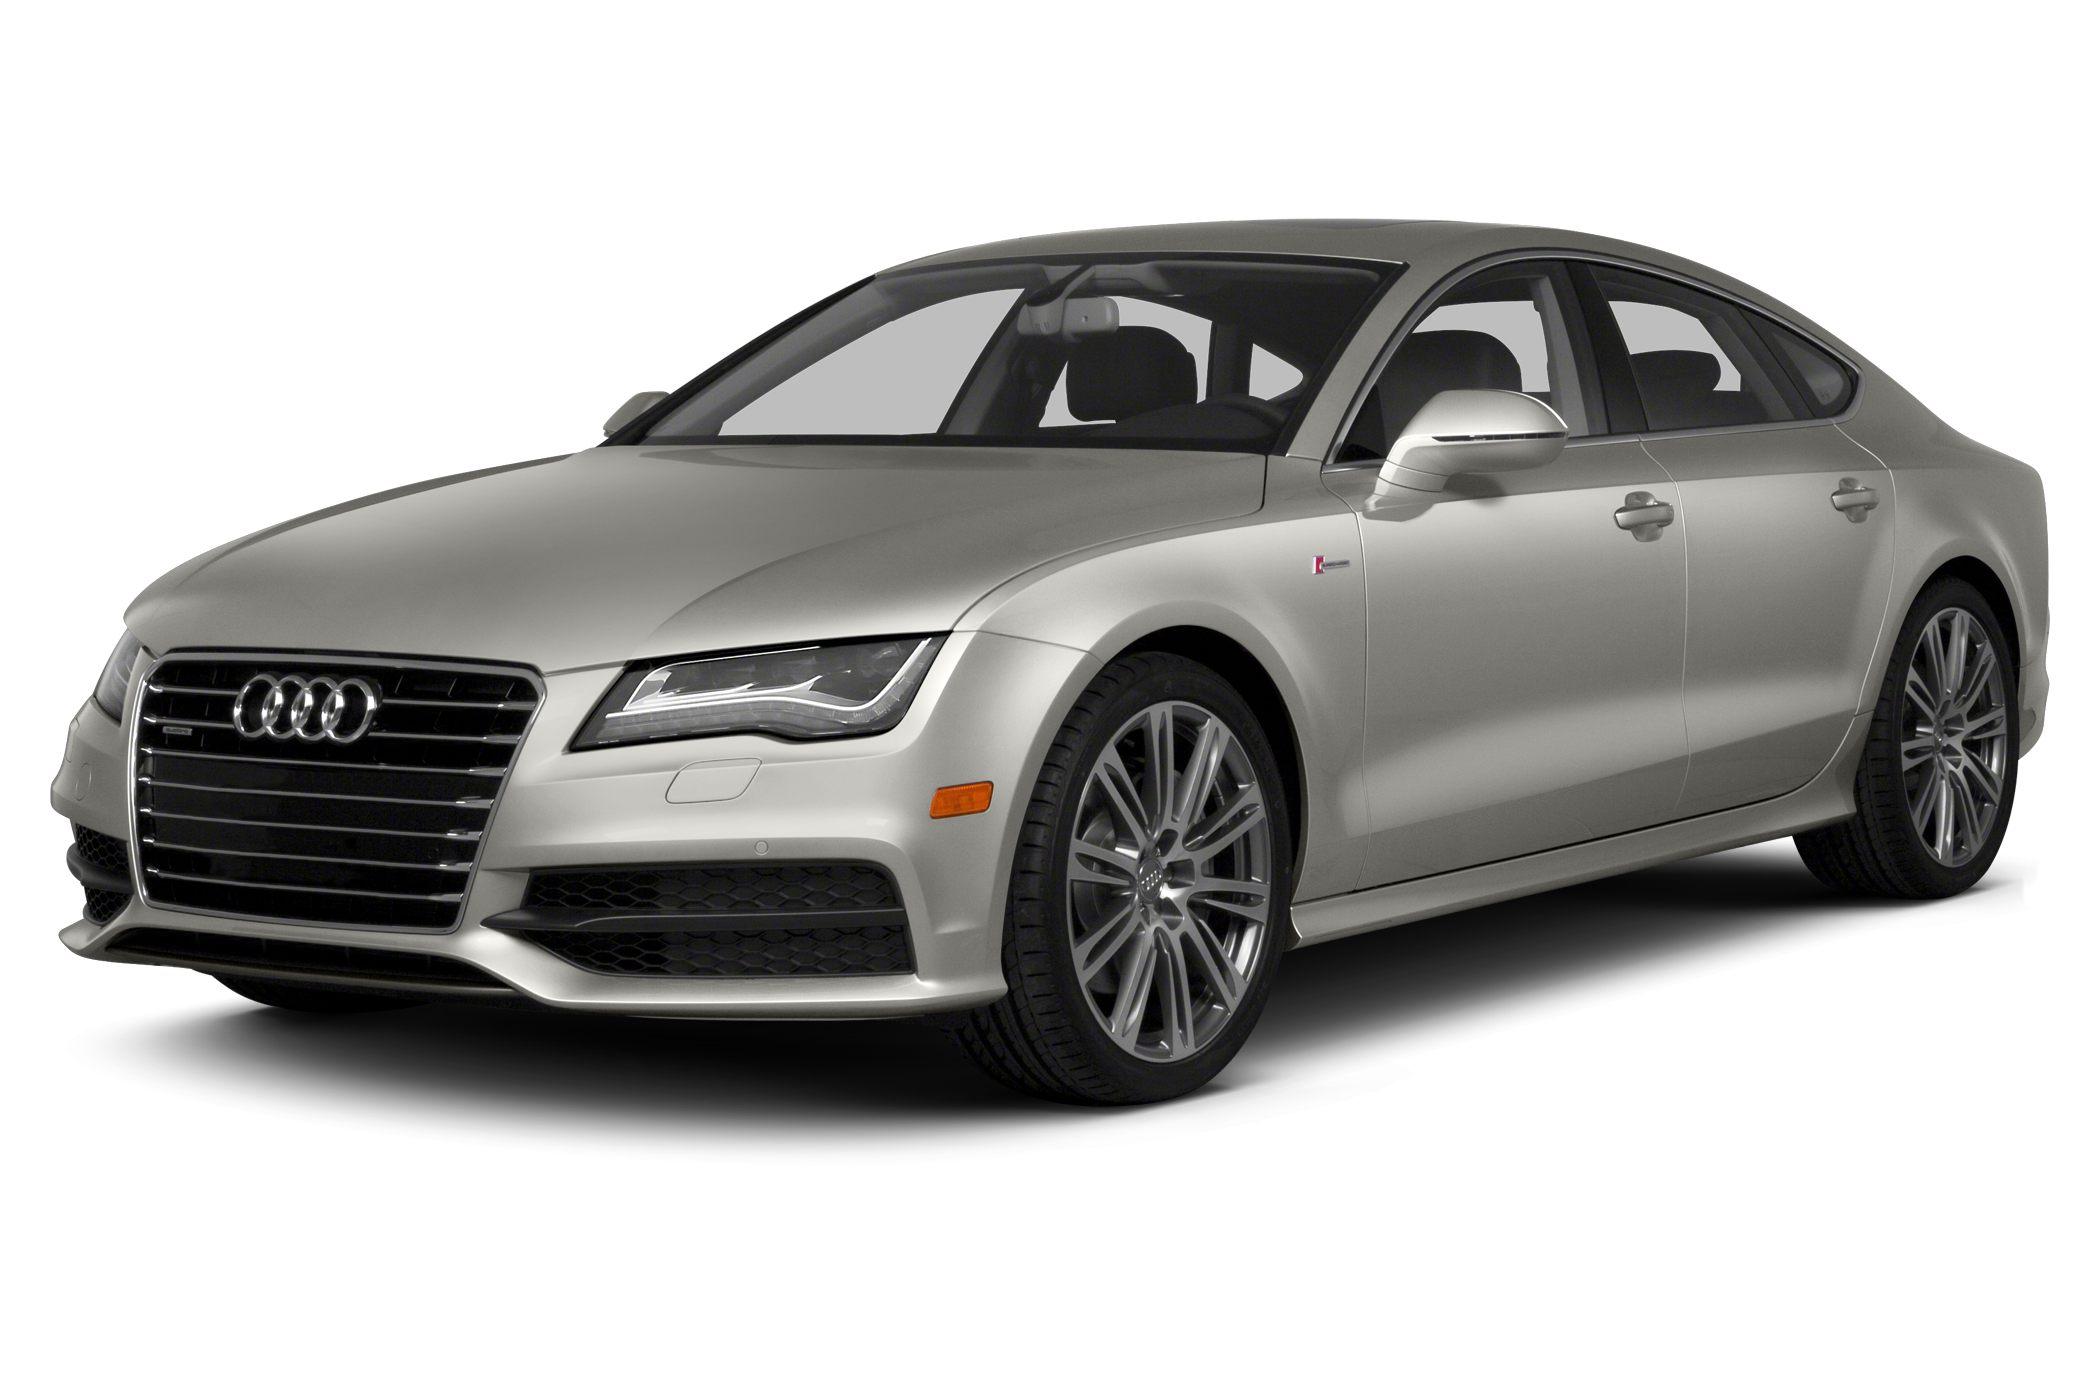 2014 Audi A7 Information